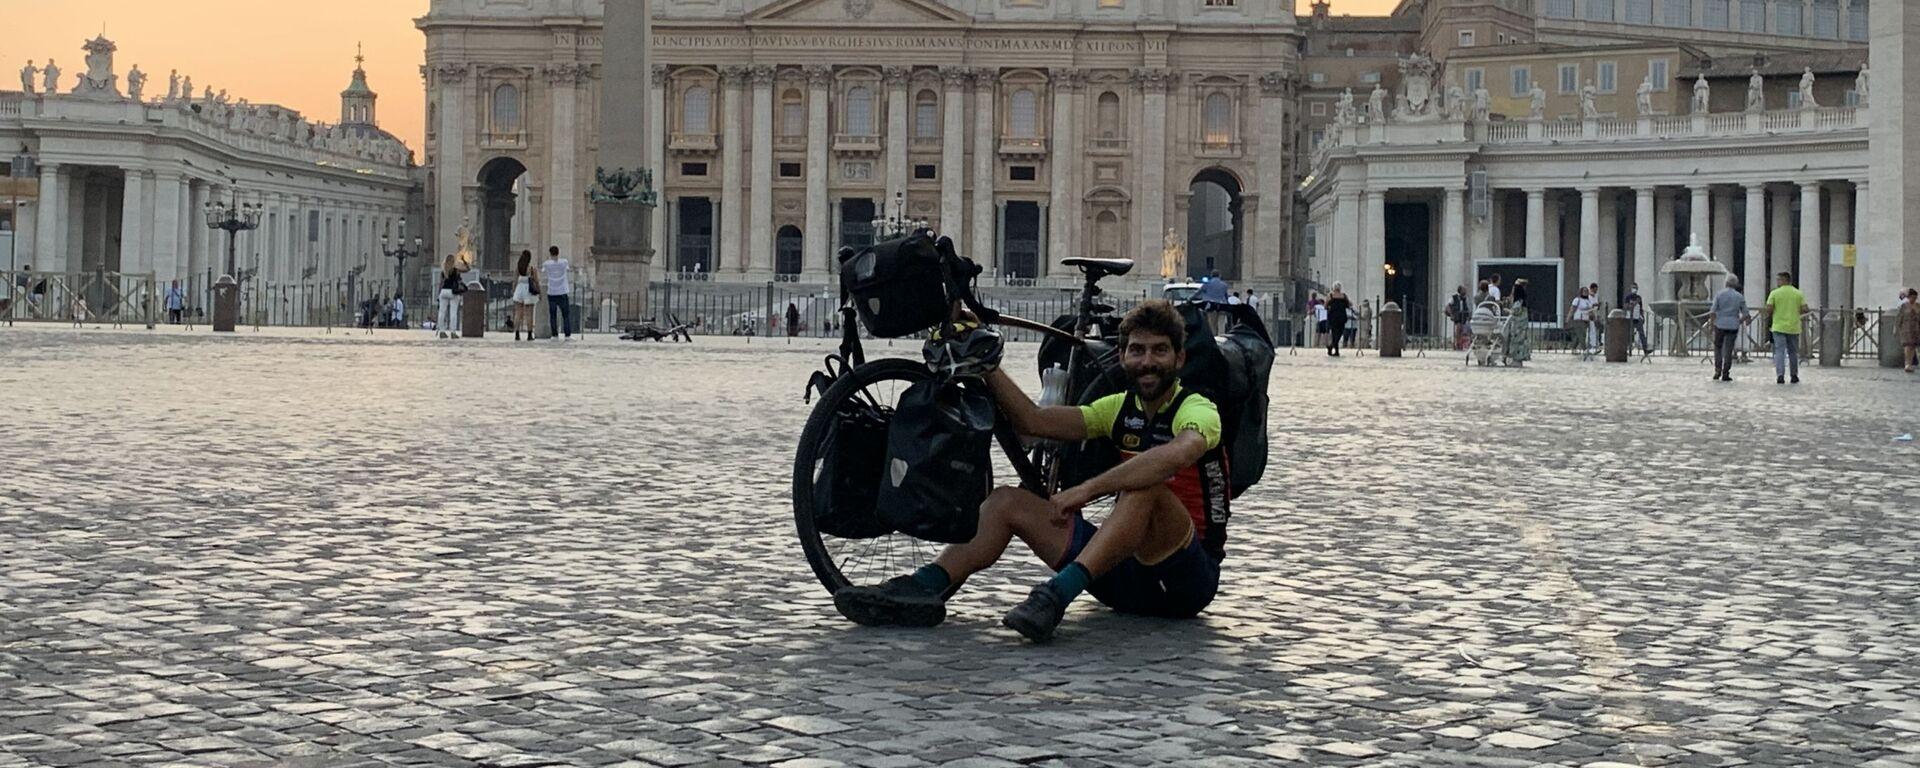 Nil Cabutí, barcelonés de 30 años que recorrió 43 países en bici durante 2020 - Sputnik Mundo, 1920, 24.01.2021